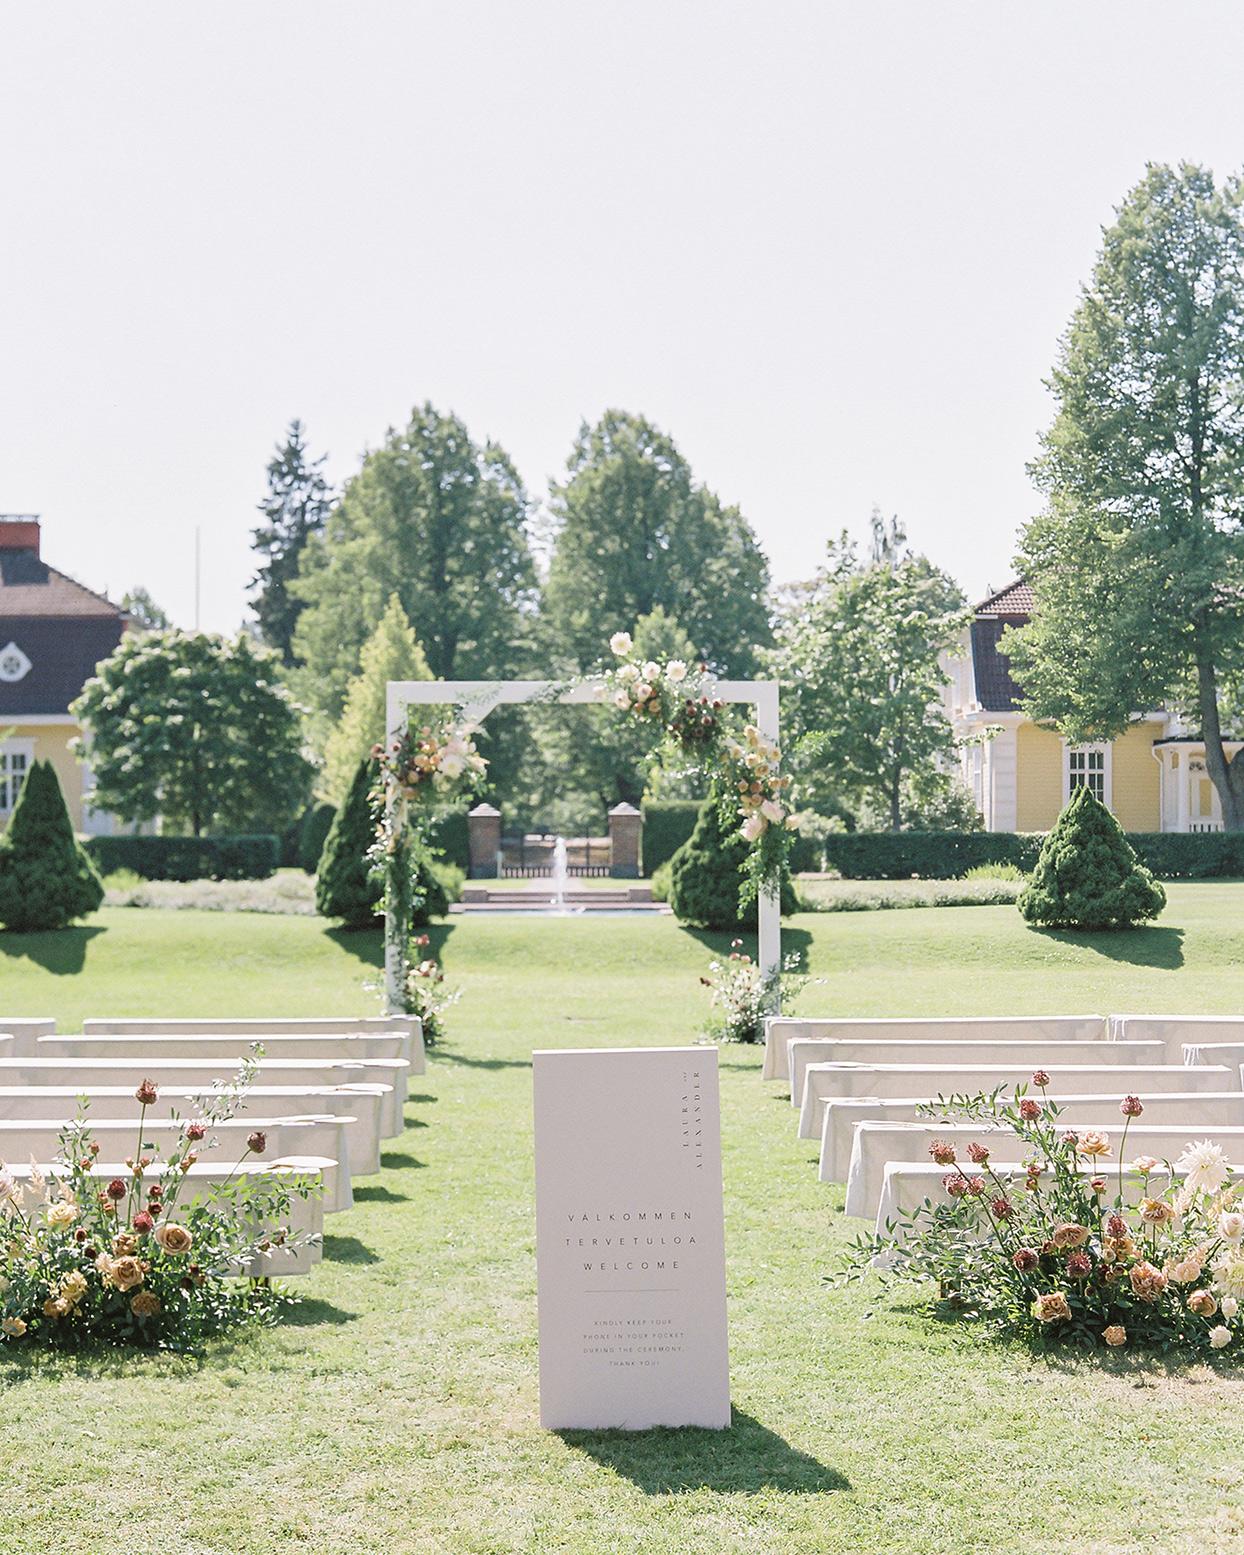 laura alexander wedding outdoor ceremony space